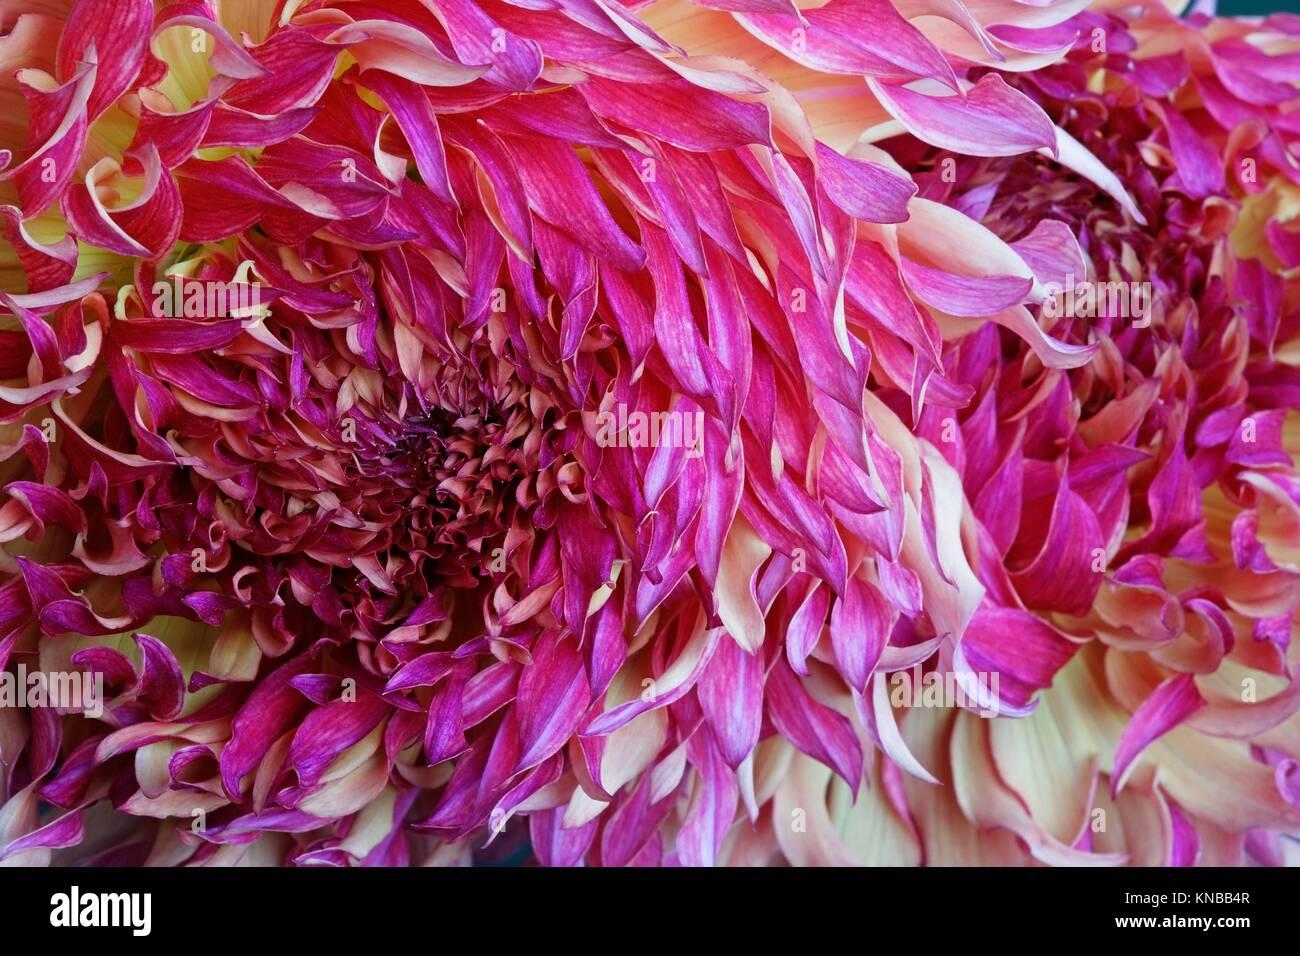 Dahlia flower (Dahlia x cultorum). Close up image of multicolored ...